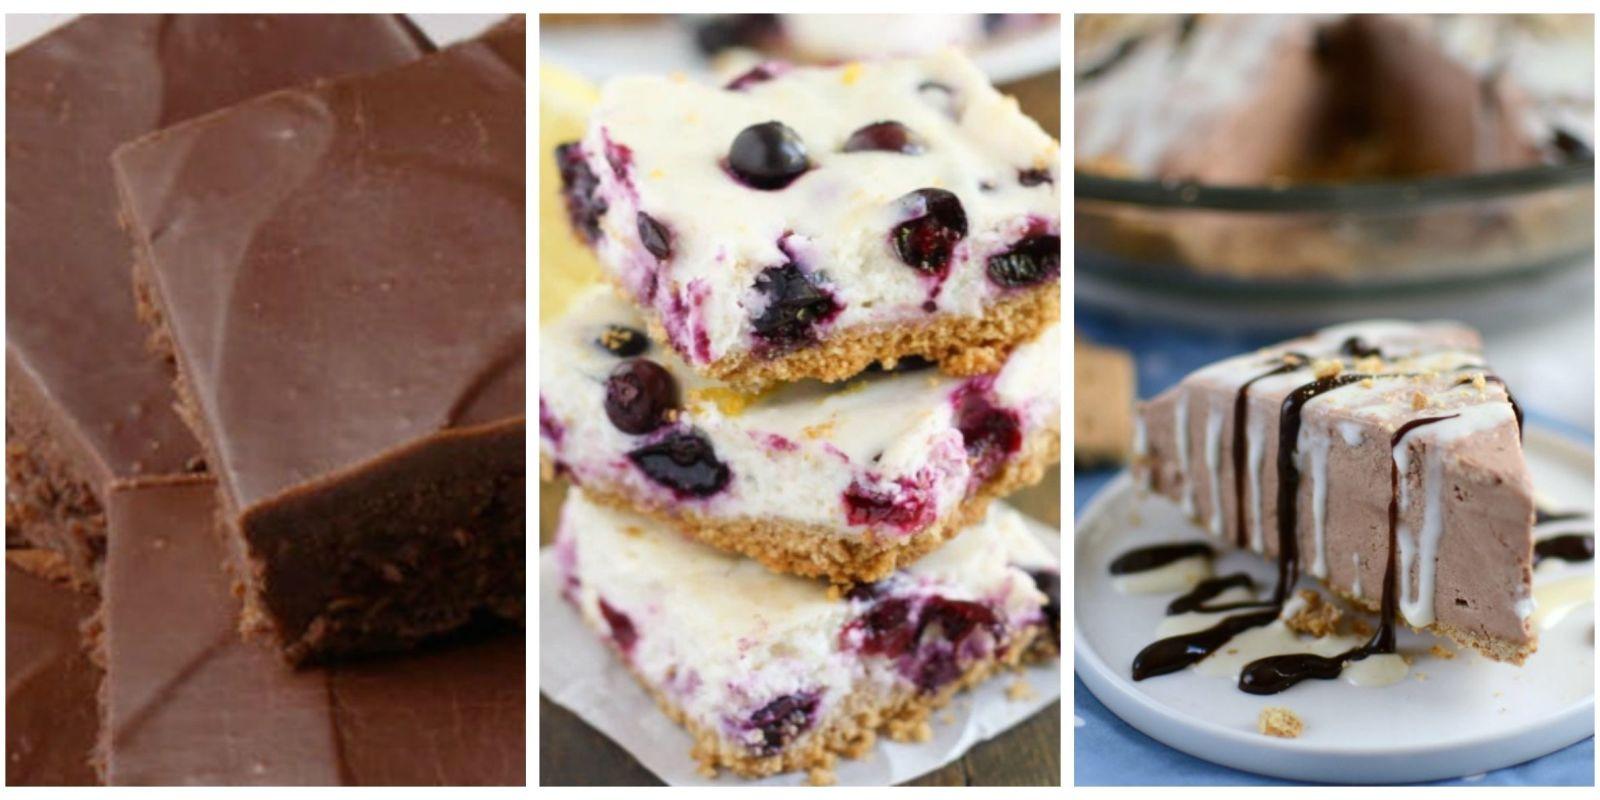 Low Calories Desserts  Low Calorie Desserts Two Ingre nt Dessert Recipes